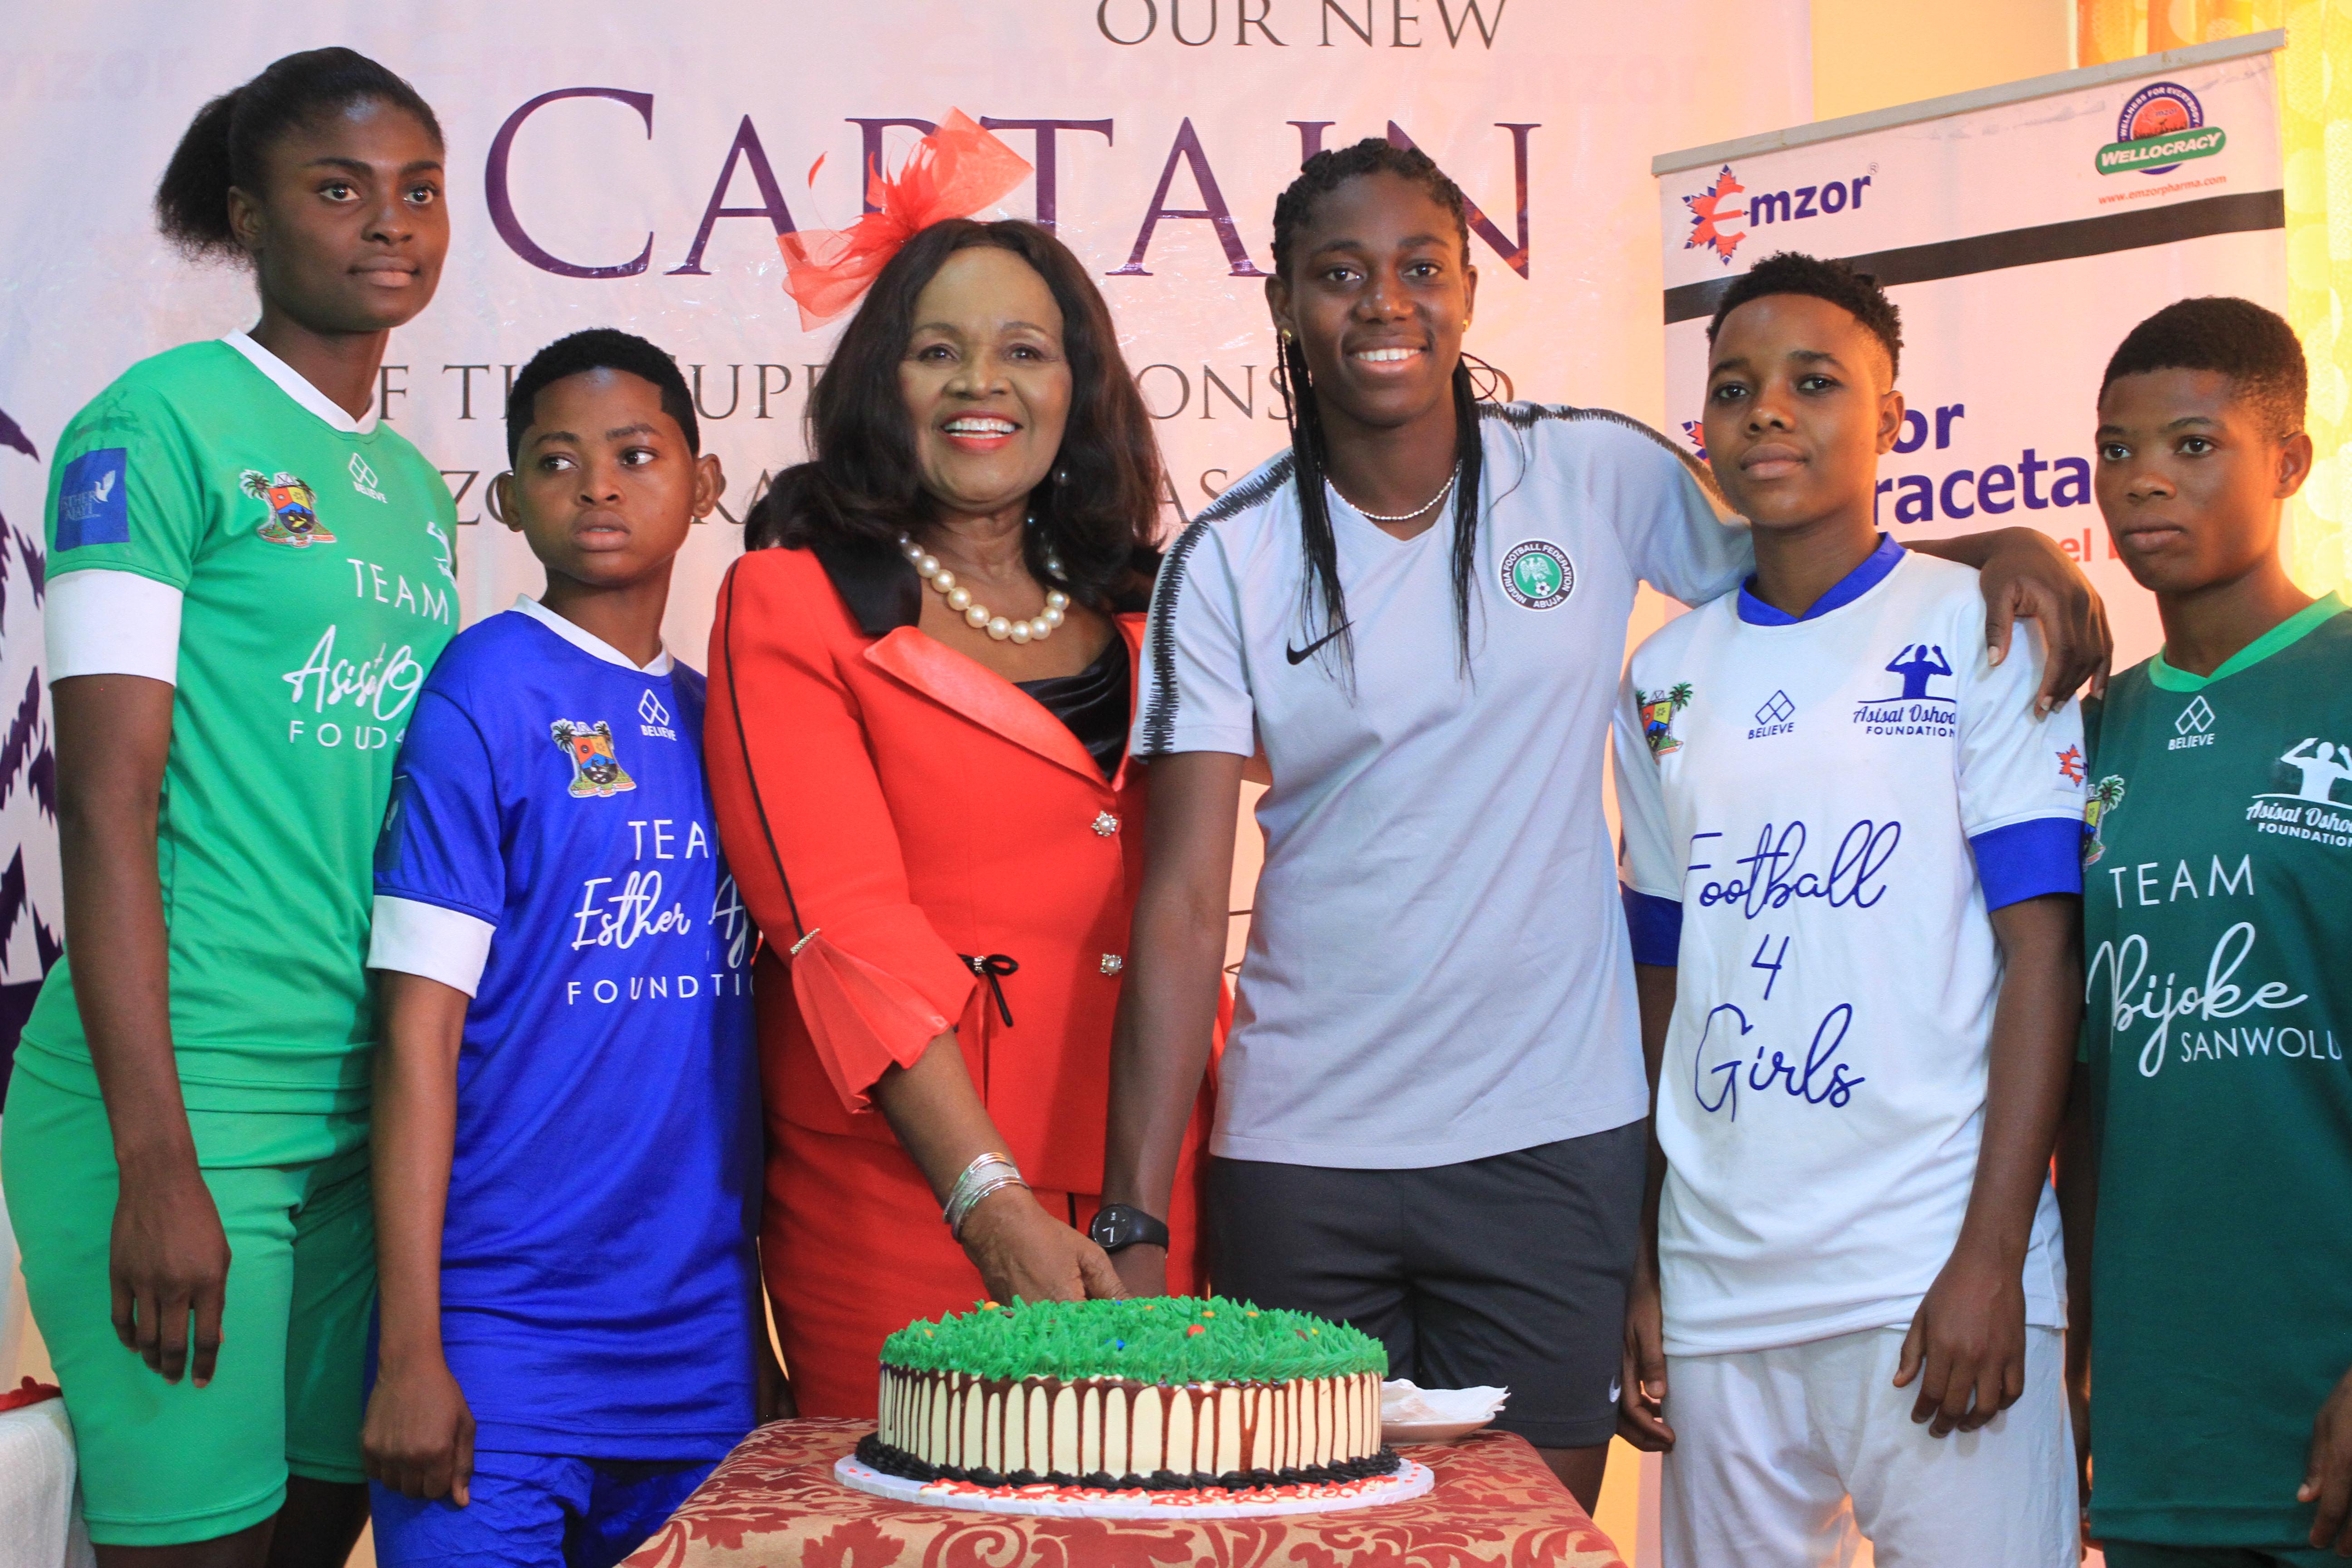 Emzor celebrates the New Captain of the Super Falcons Asisat Oshoala & We've got Photos